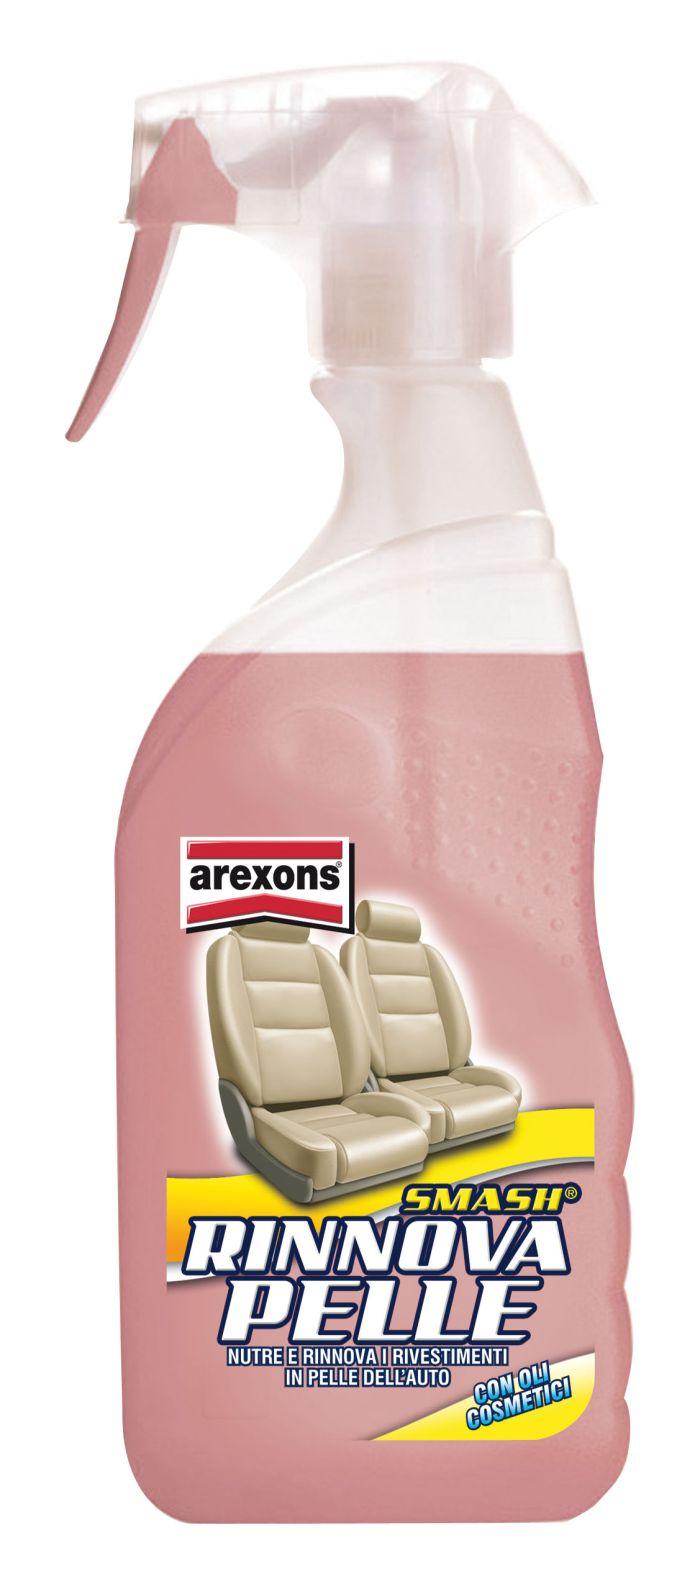 Linea Car Care Arexons: Smash Rinnova Pelle, come usarlo (video).